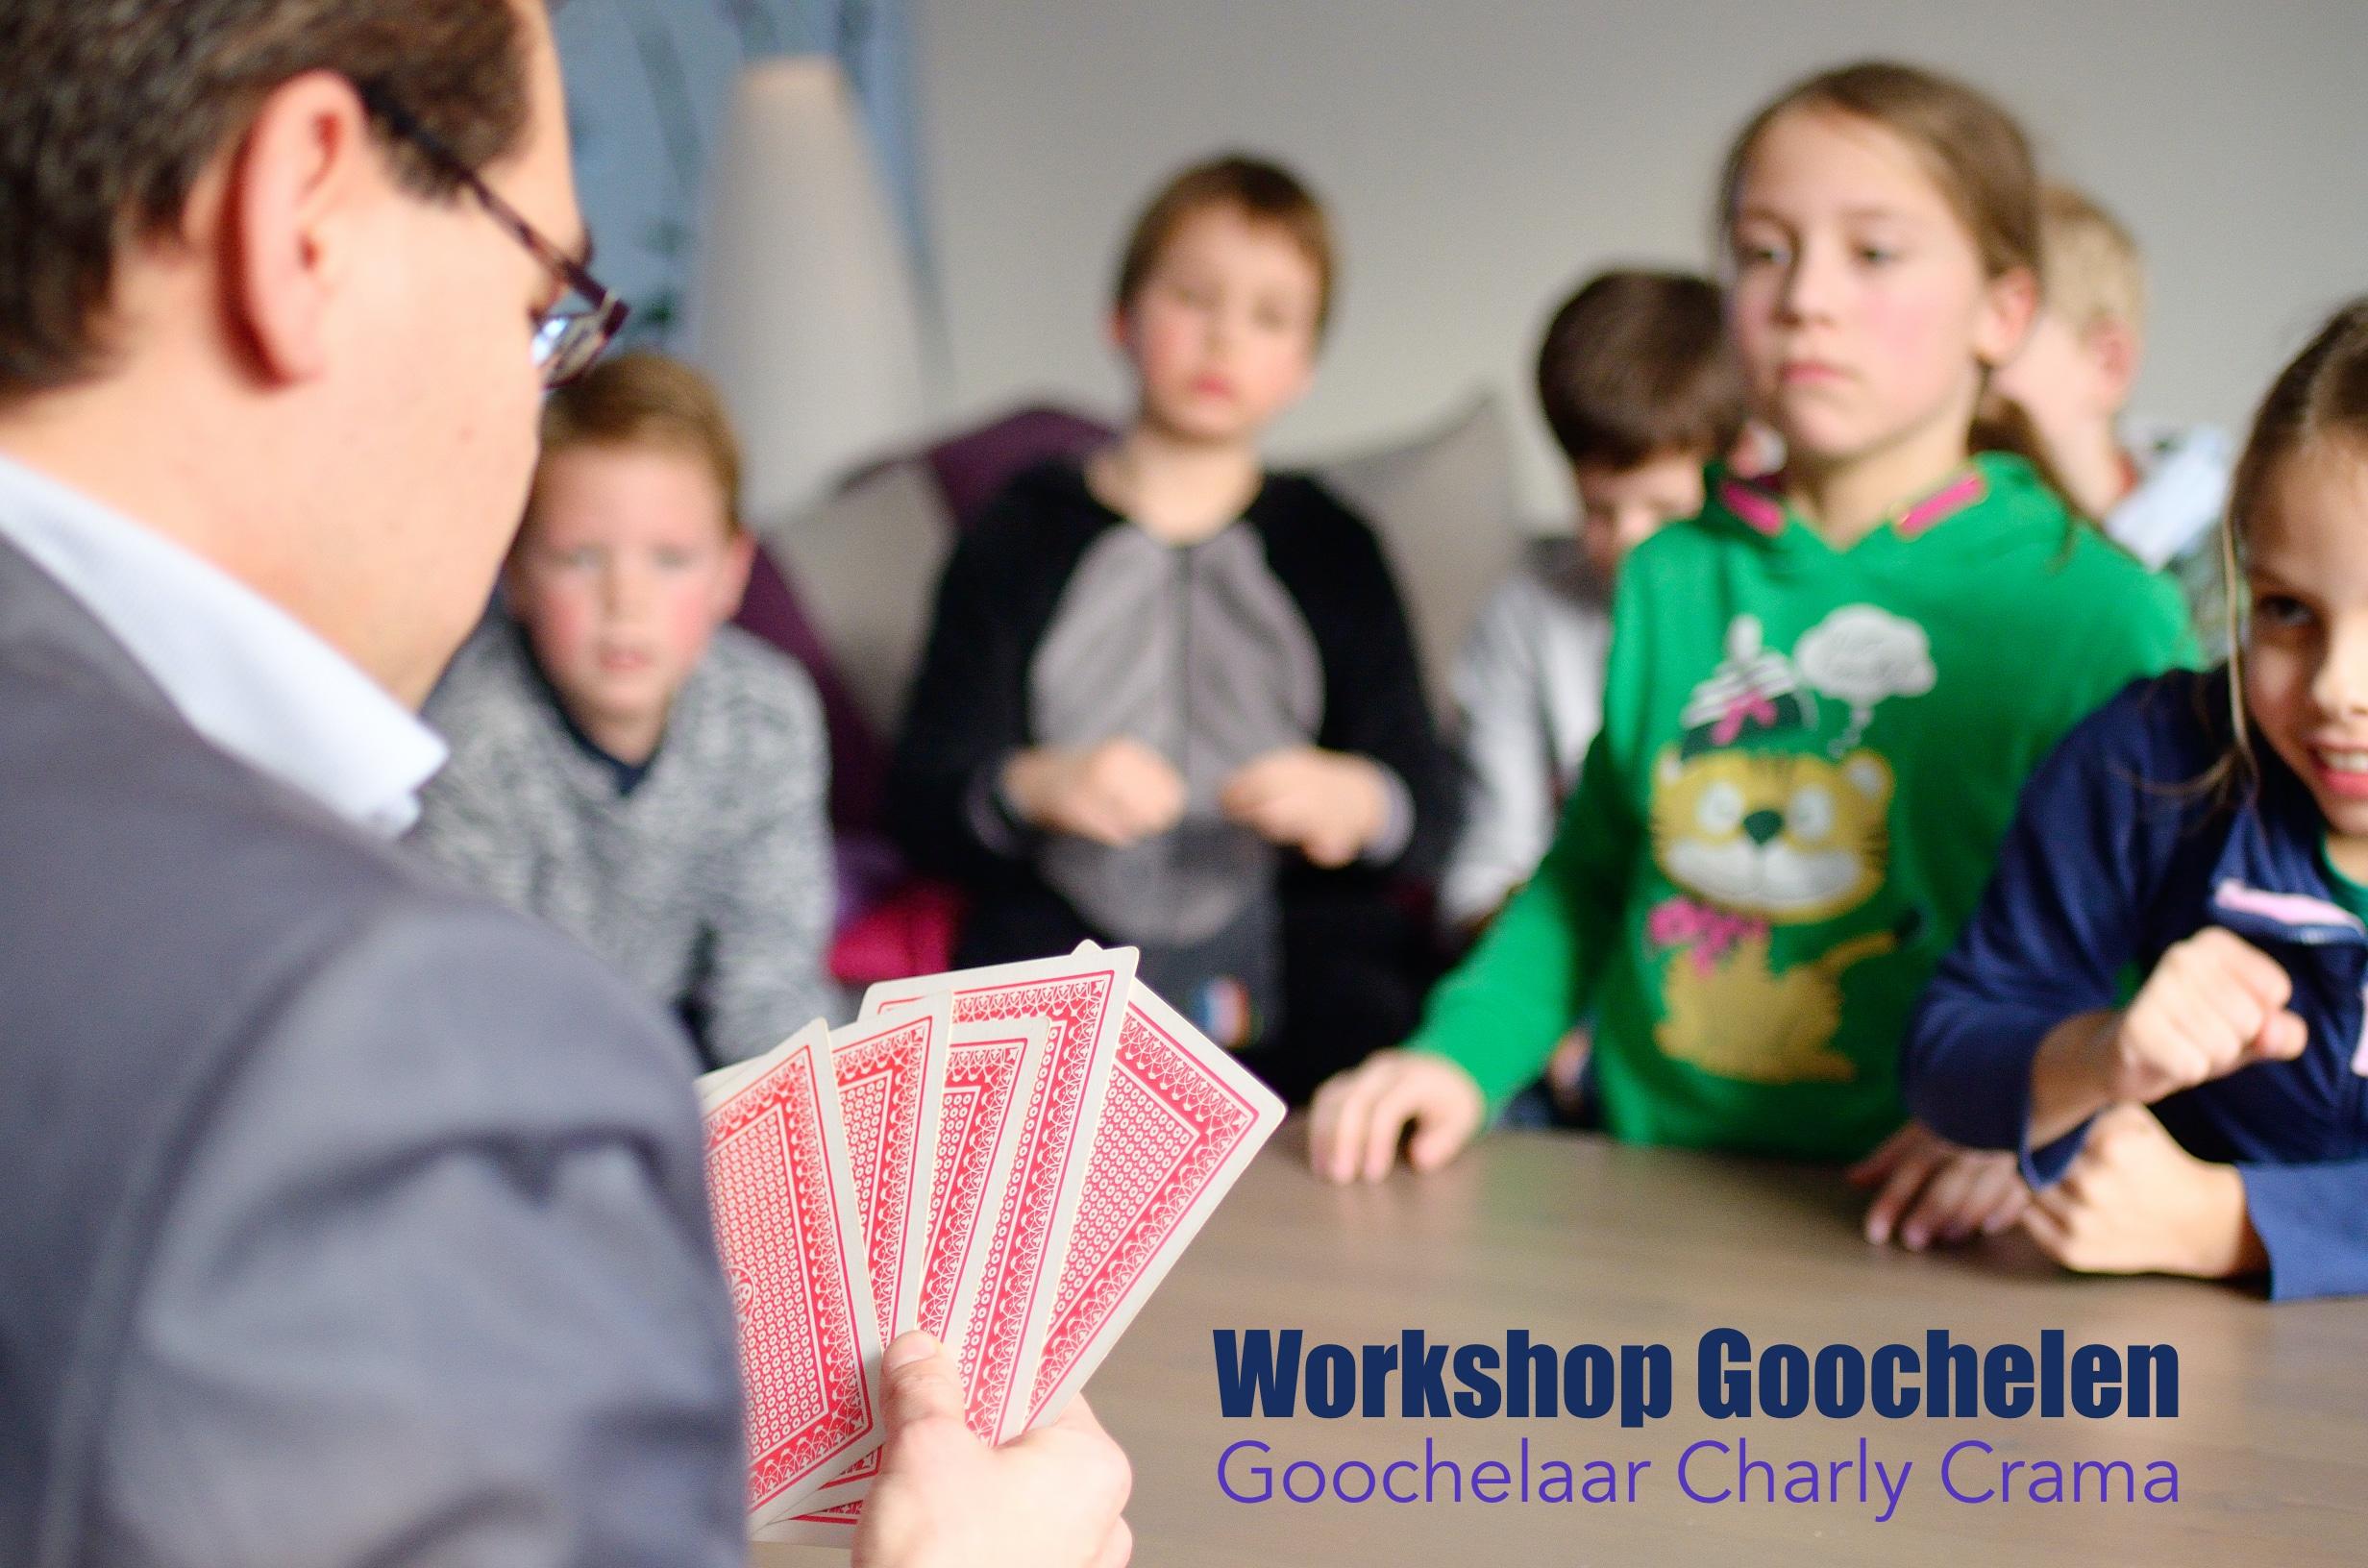 Workshop Goochelen Goochelaar Charly Crama_1